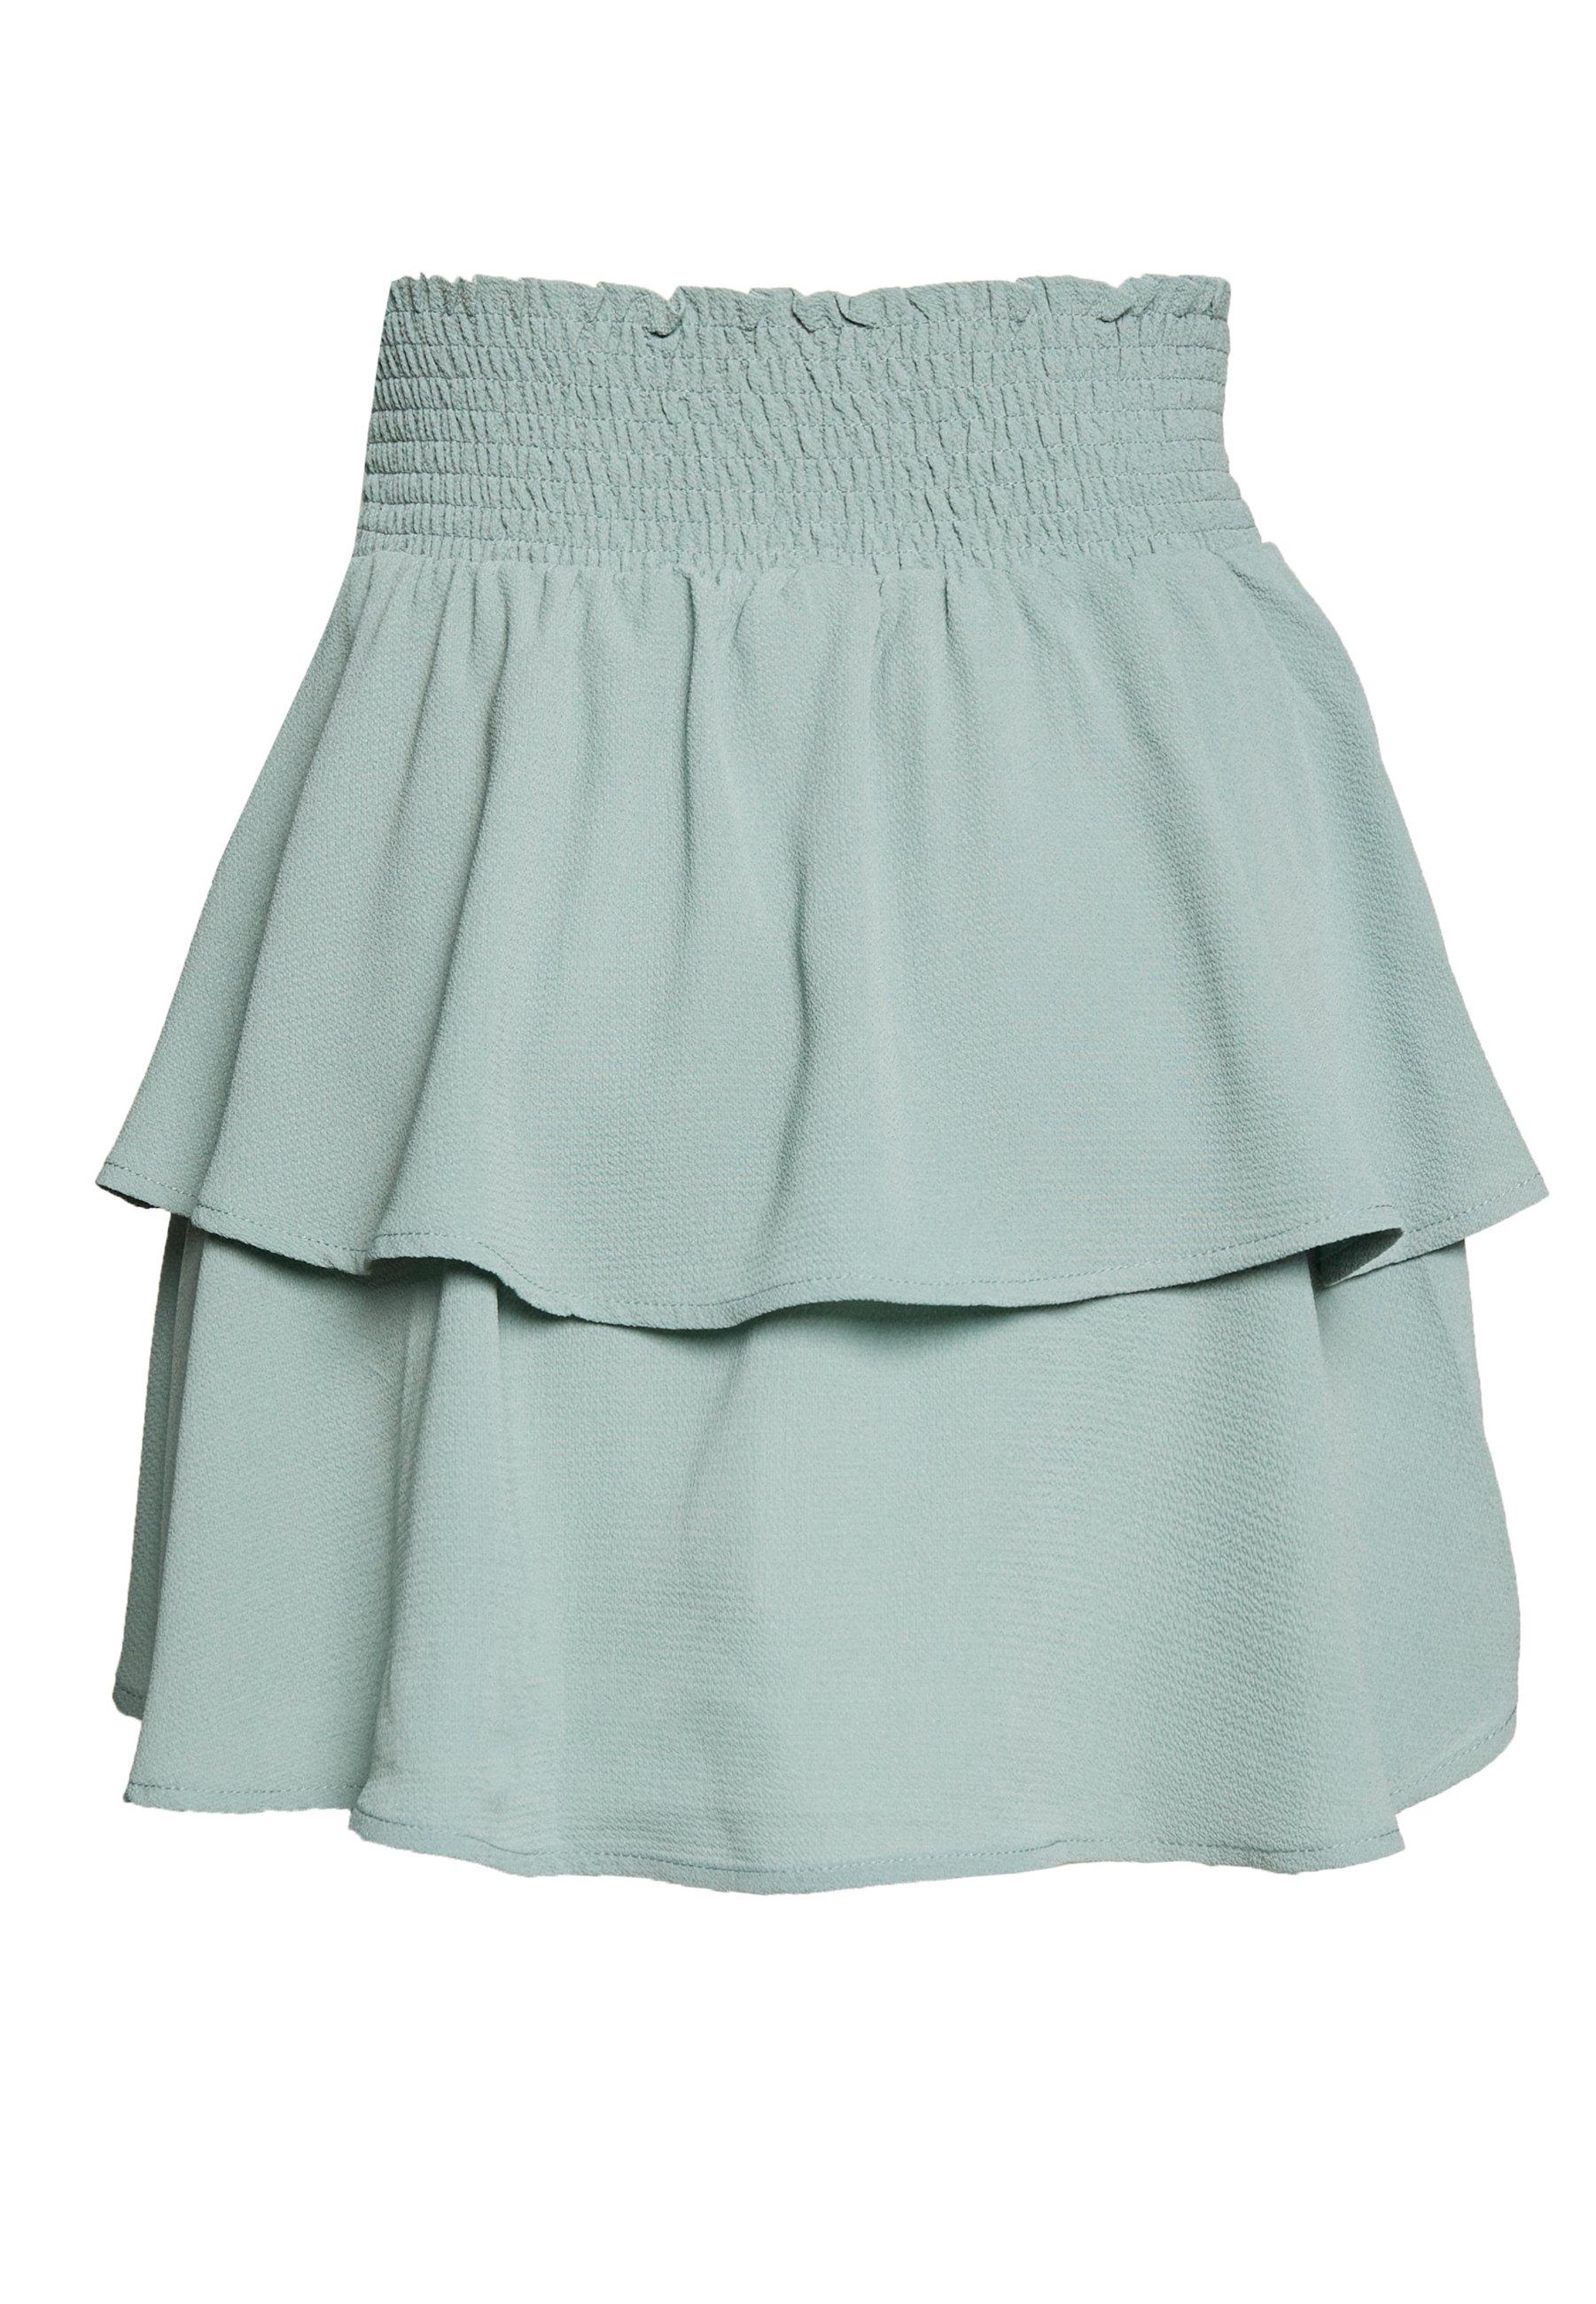 Gröna Plisserade kjolar online | Dam | Zalando